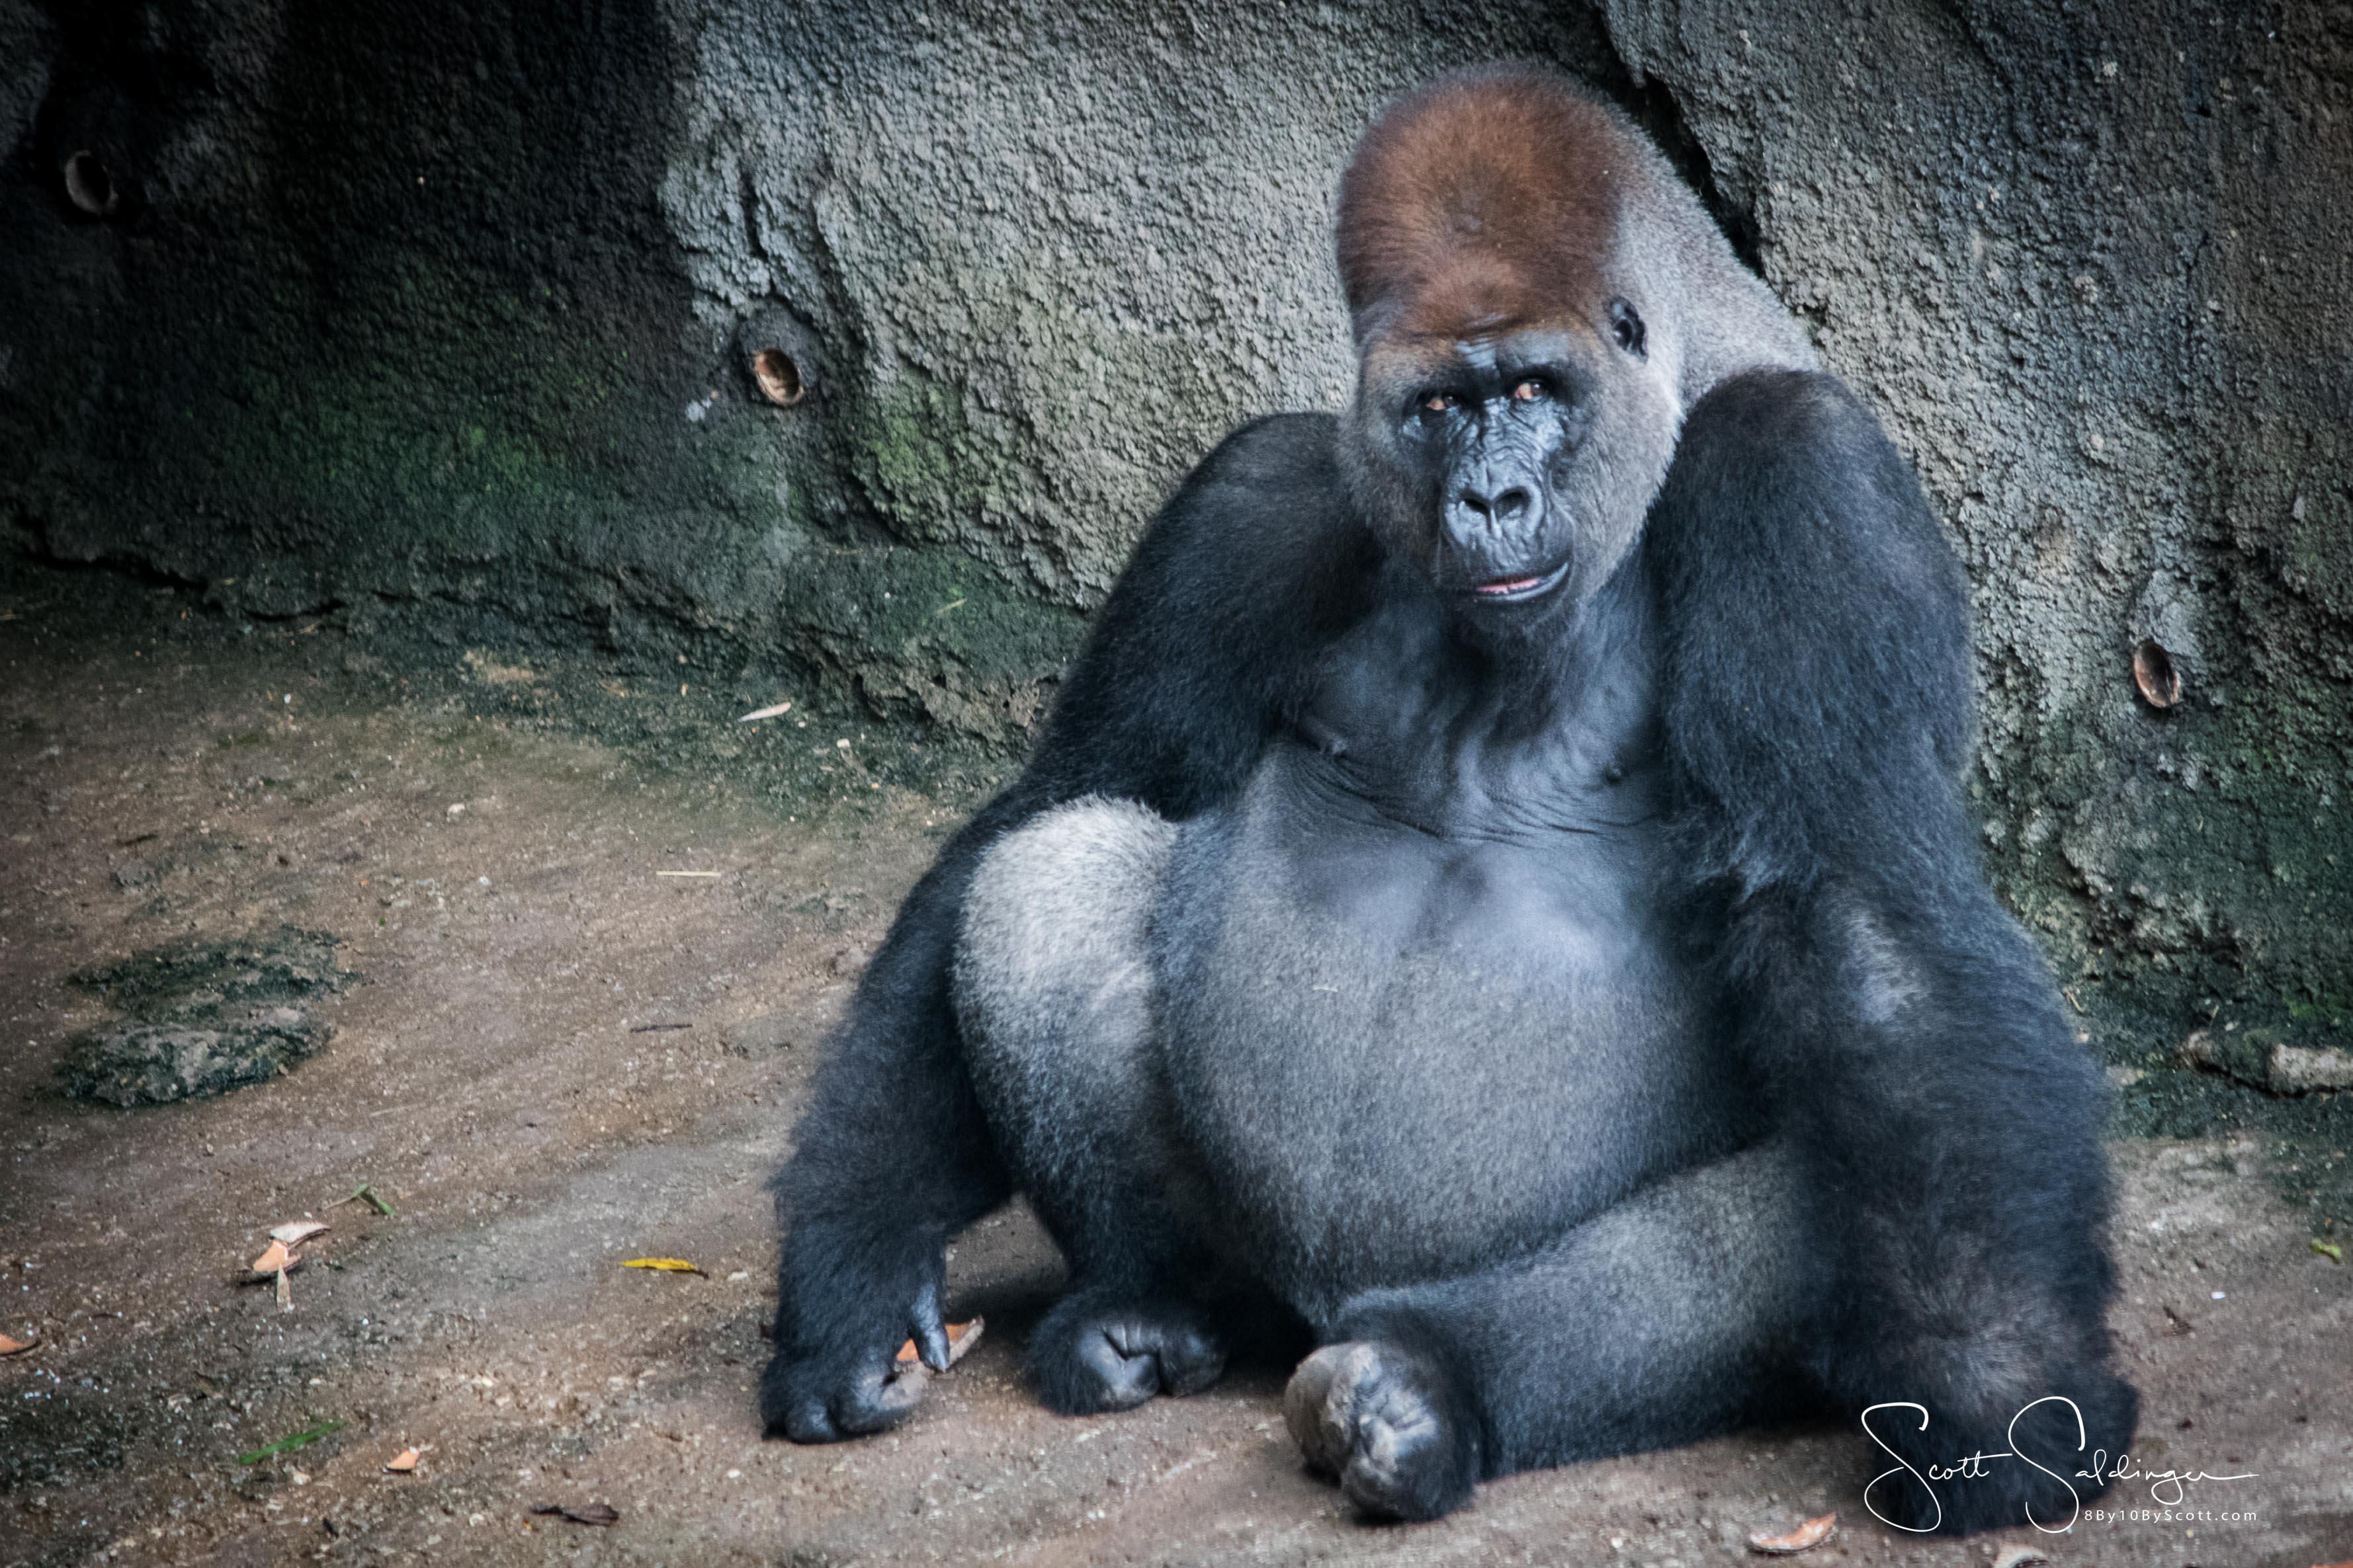 Apes-4965